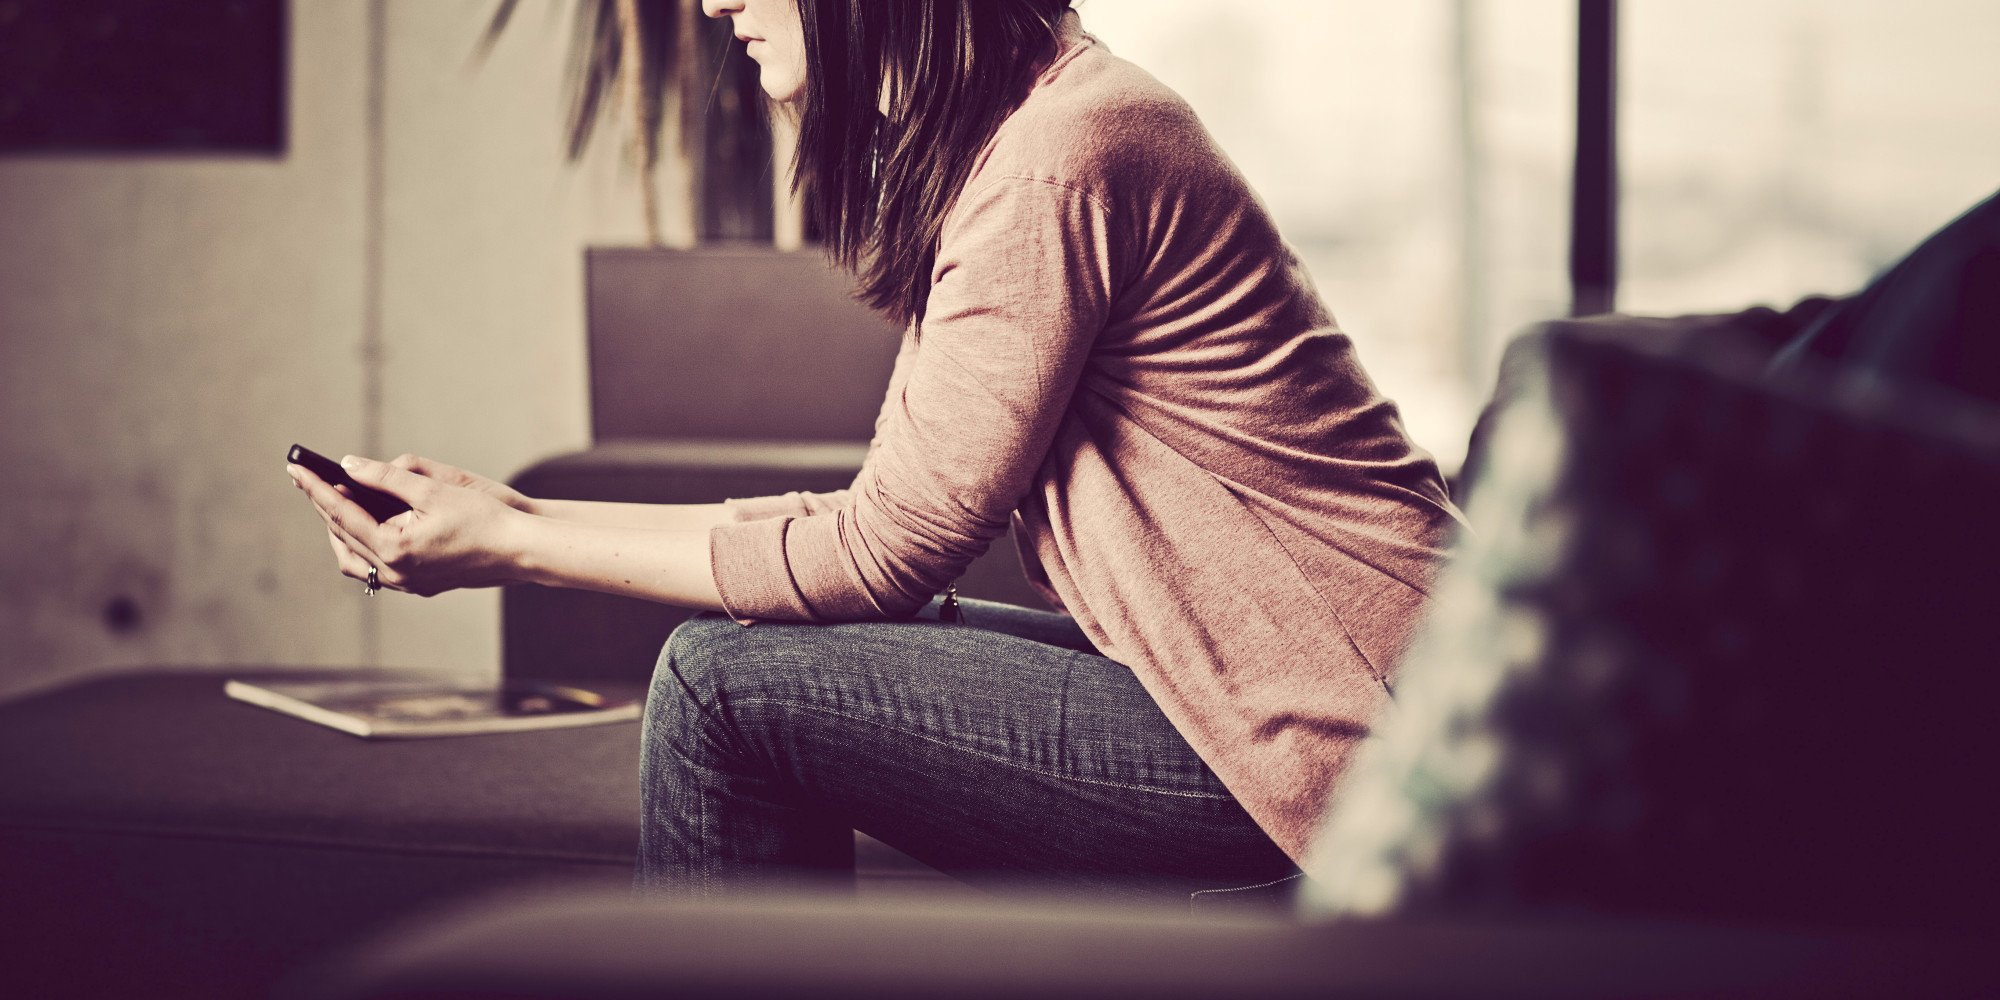 mujer mandando mensaje por el celular